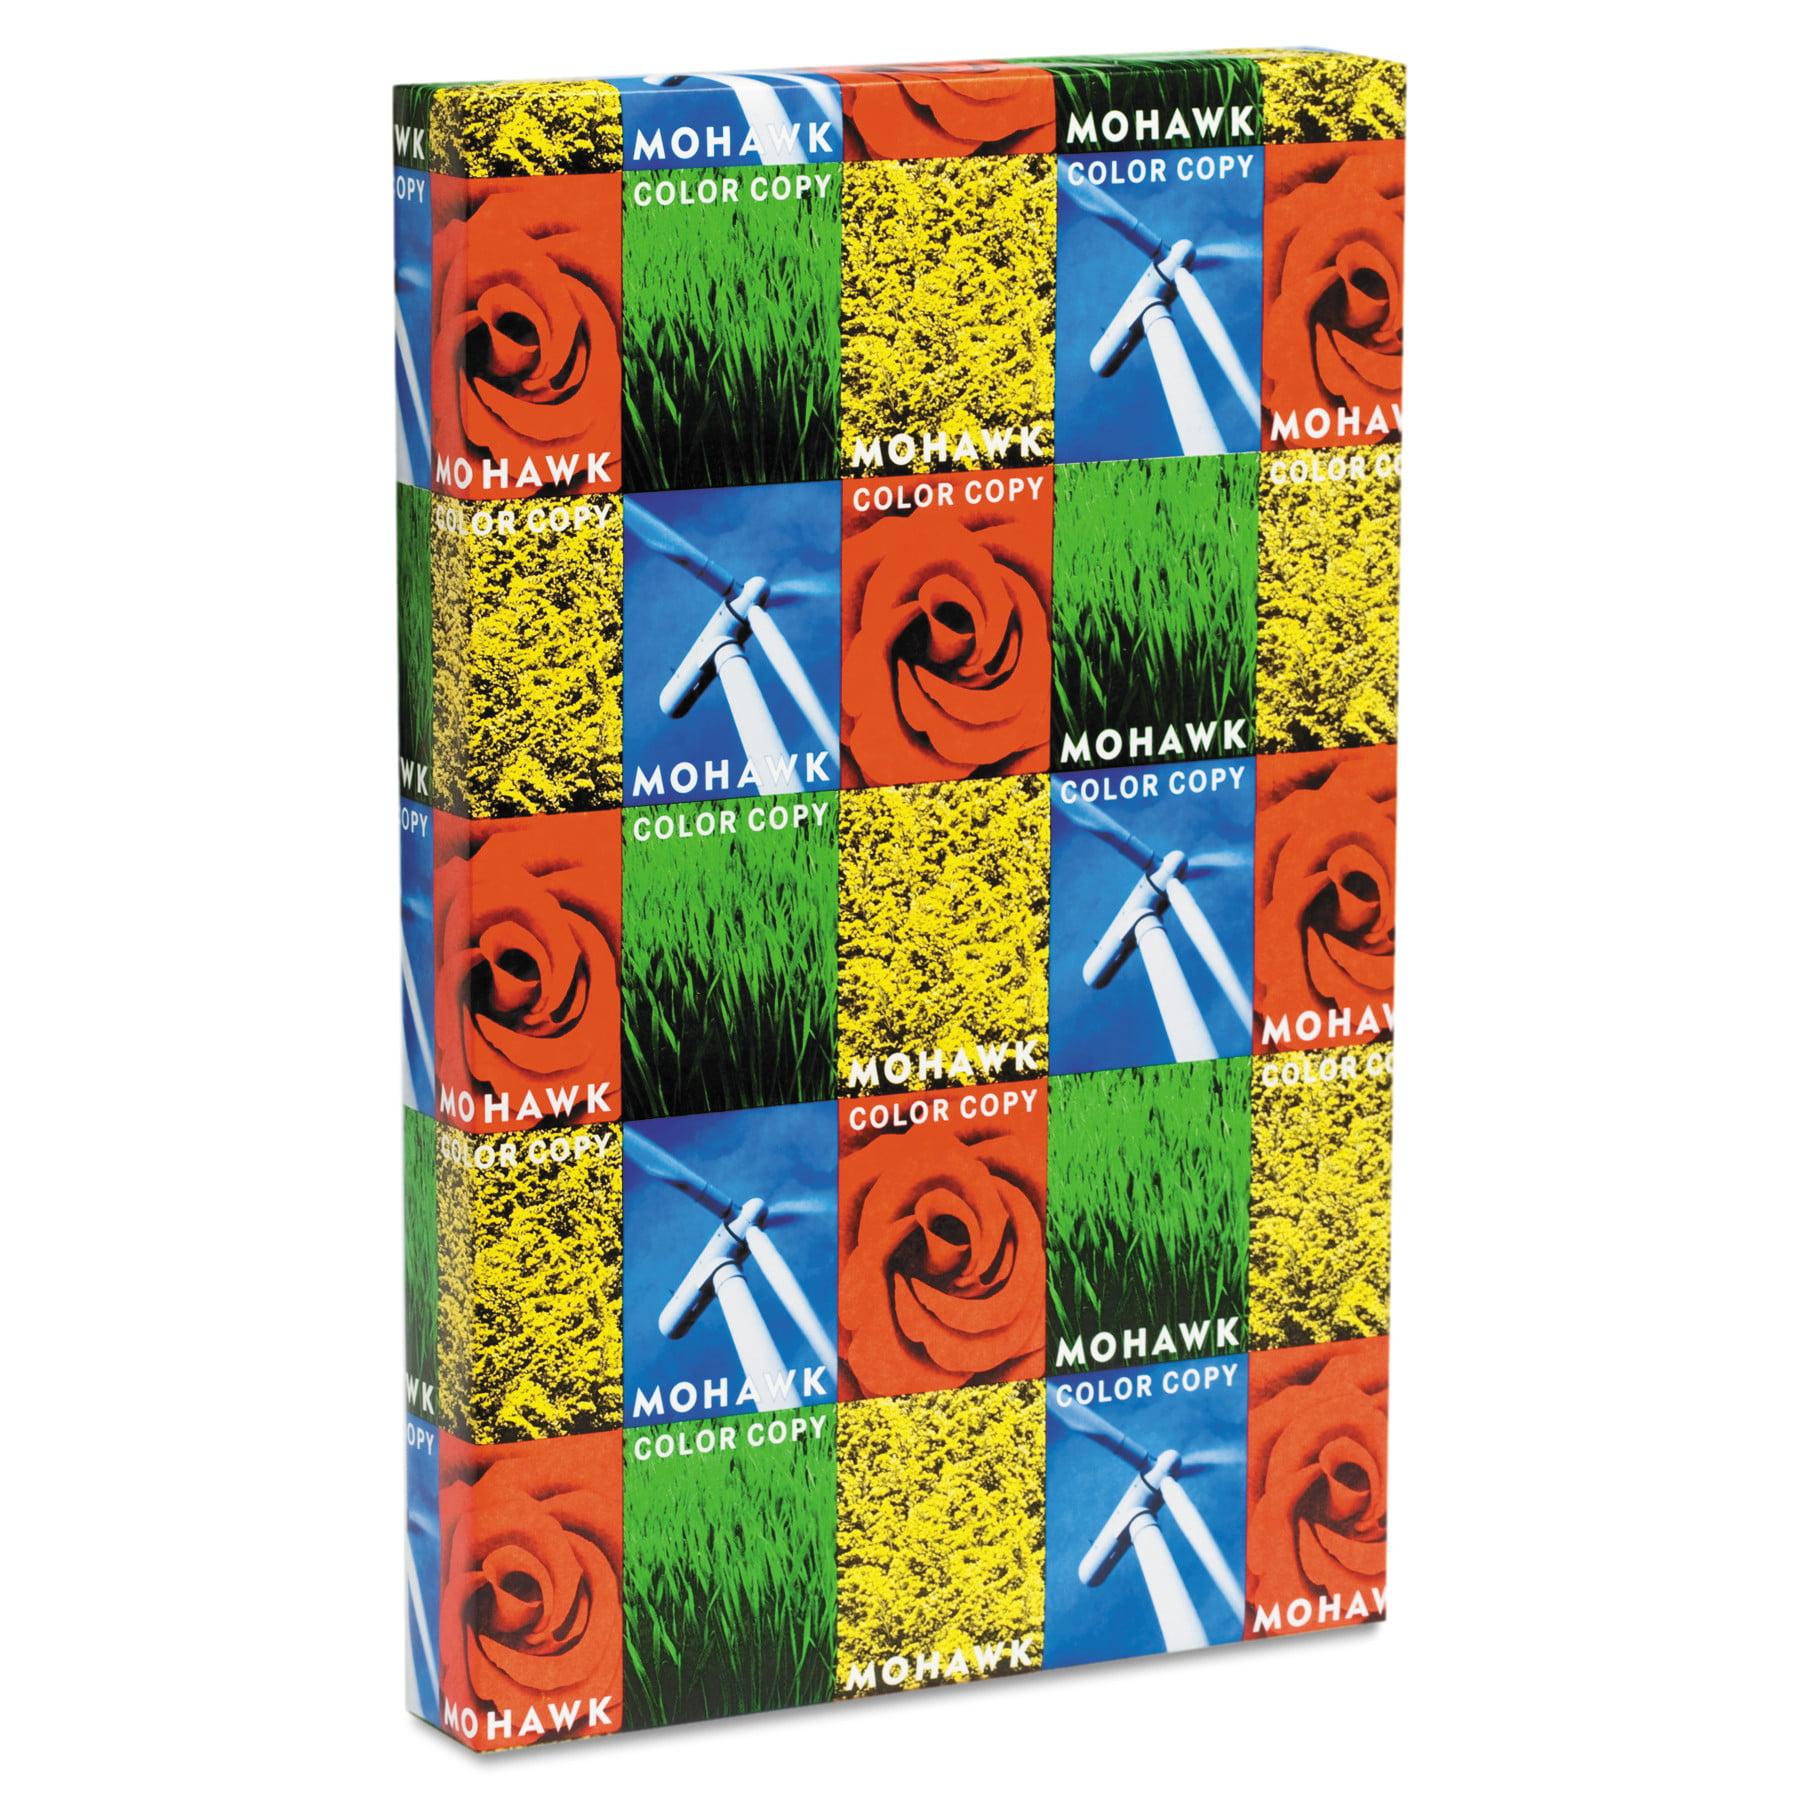 Mohawk Copier 98 Cover, 80lb, 17 x 11, Bright White, 250 Sheets -MOW12215